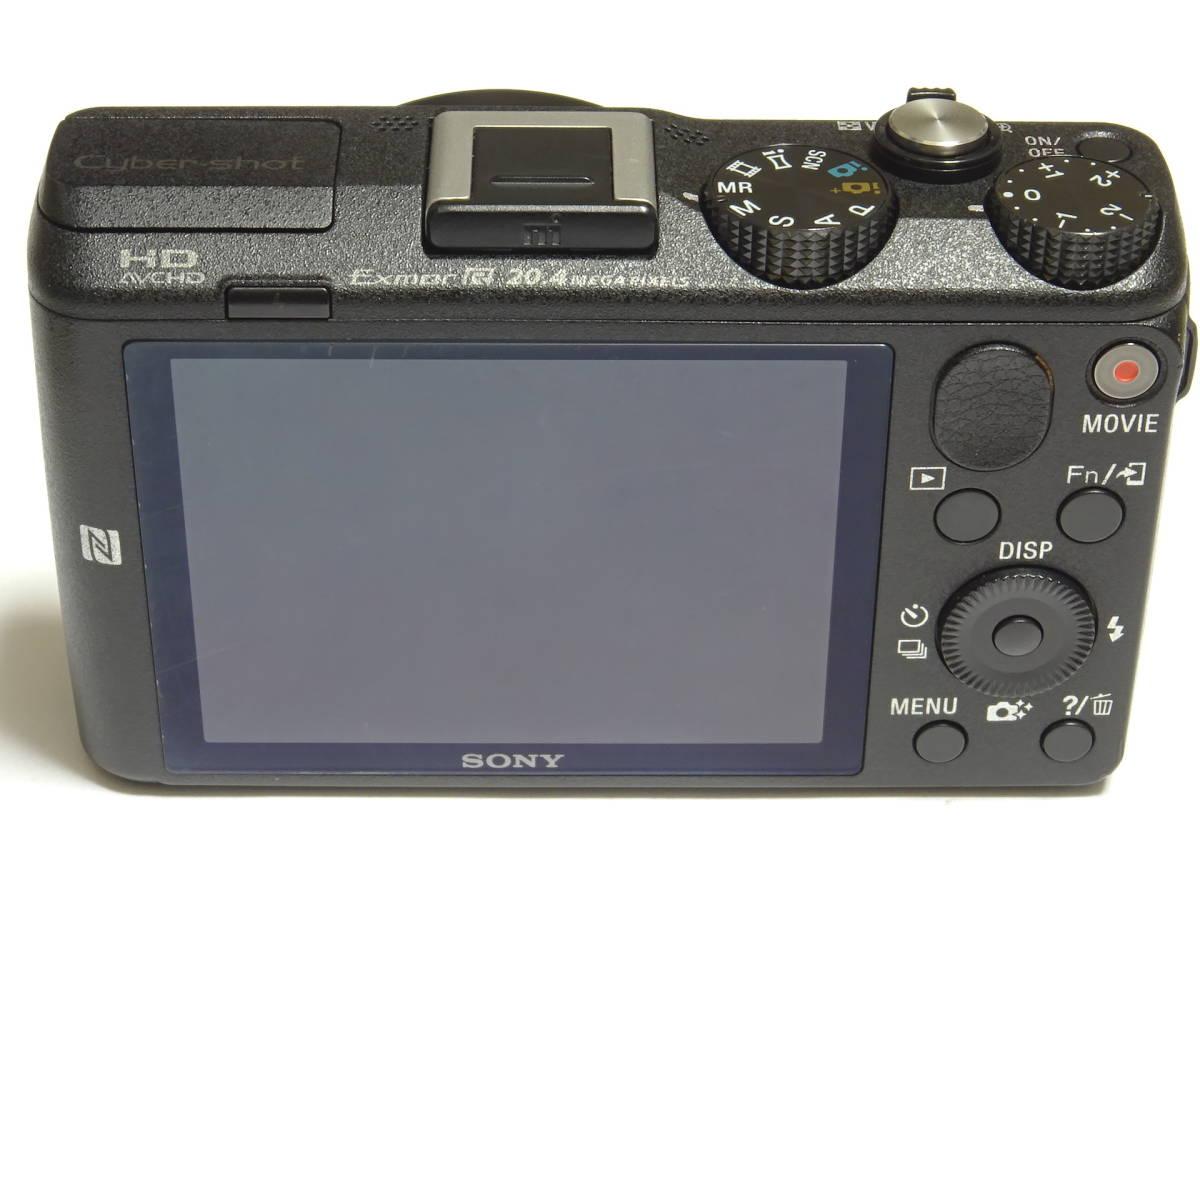 SONY Cyber-shot DSC-HX60V 2040万画素 光学30倍 Full HD 1080 60p 動画撮影 GPS Wi-Fi NFC 中古本体・箱・取説付き ☆動作品☆ 0899_画像4